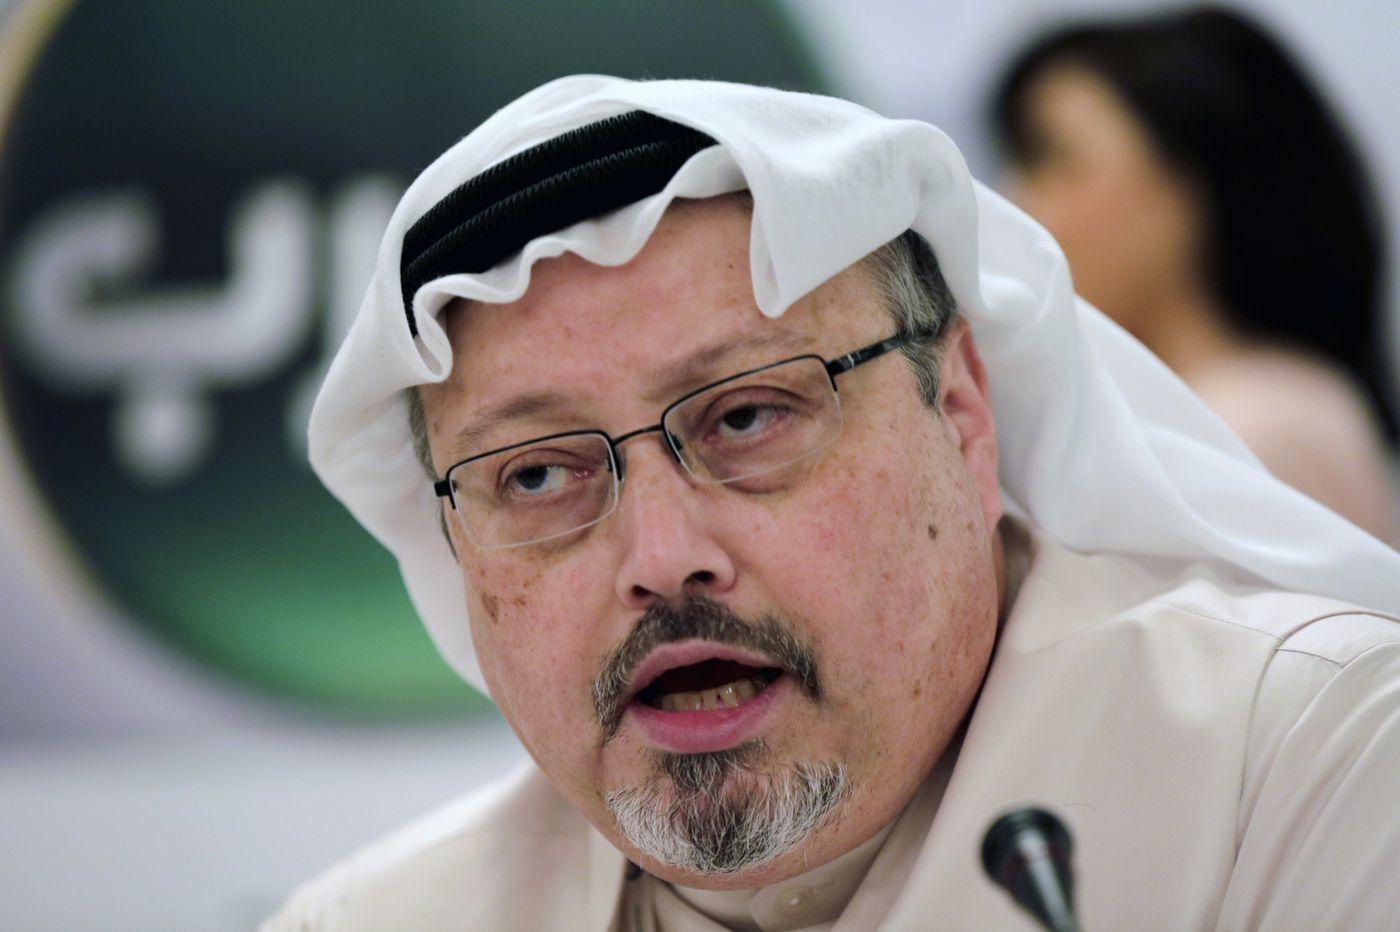 Pompeo denies U.S. trying to cover up Khashoggi killing